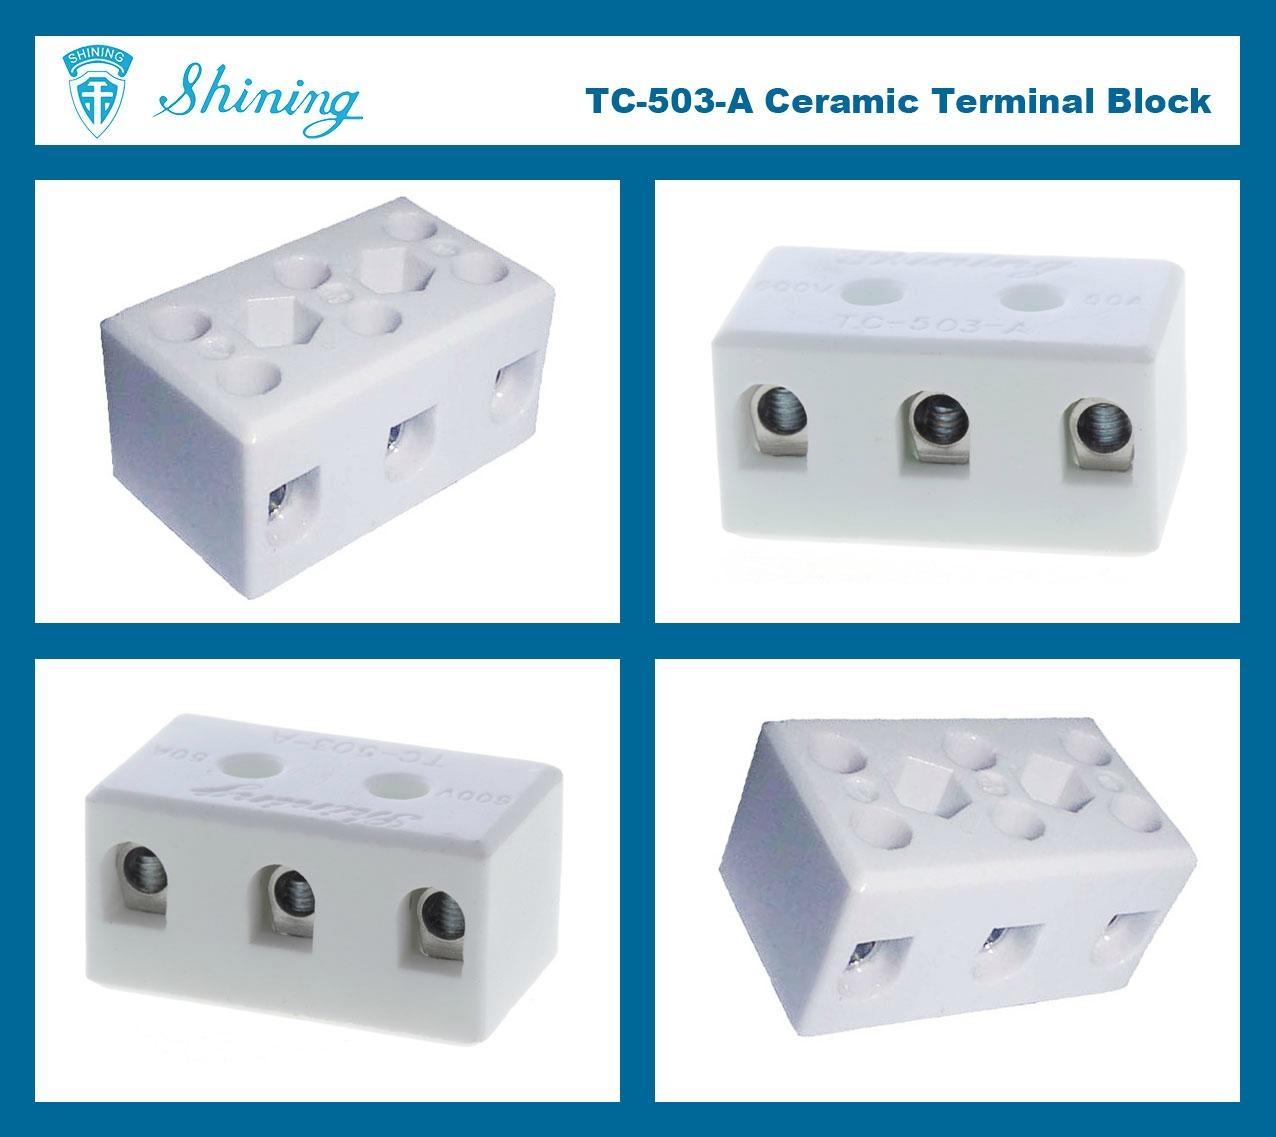 TC-503-A 陶瓷端子台 Ceramic Terminal Block 6